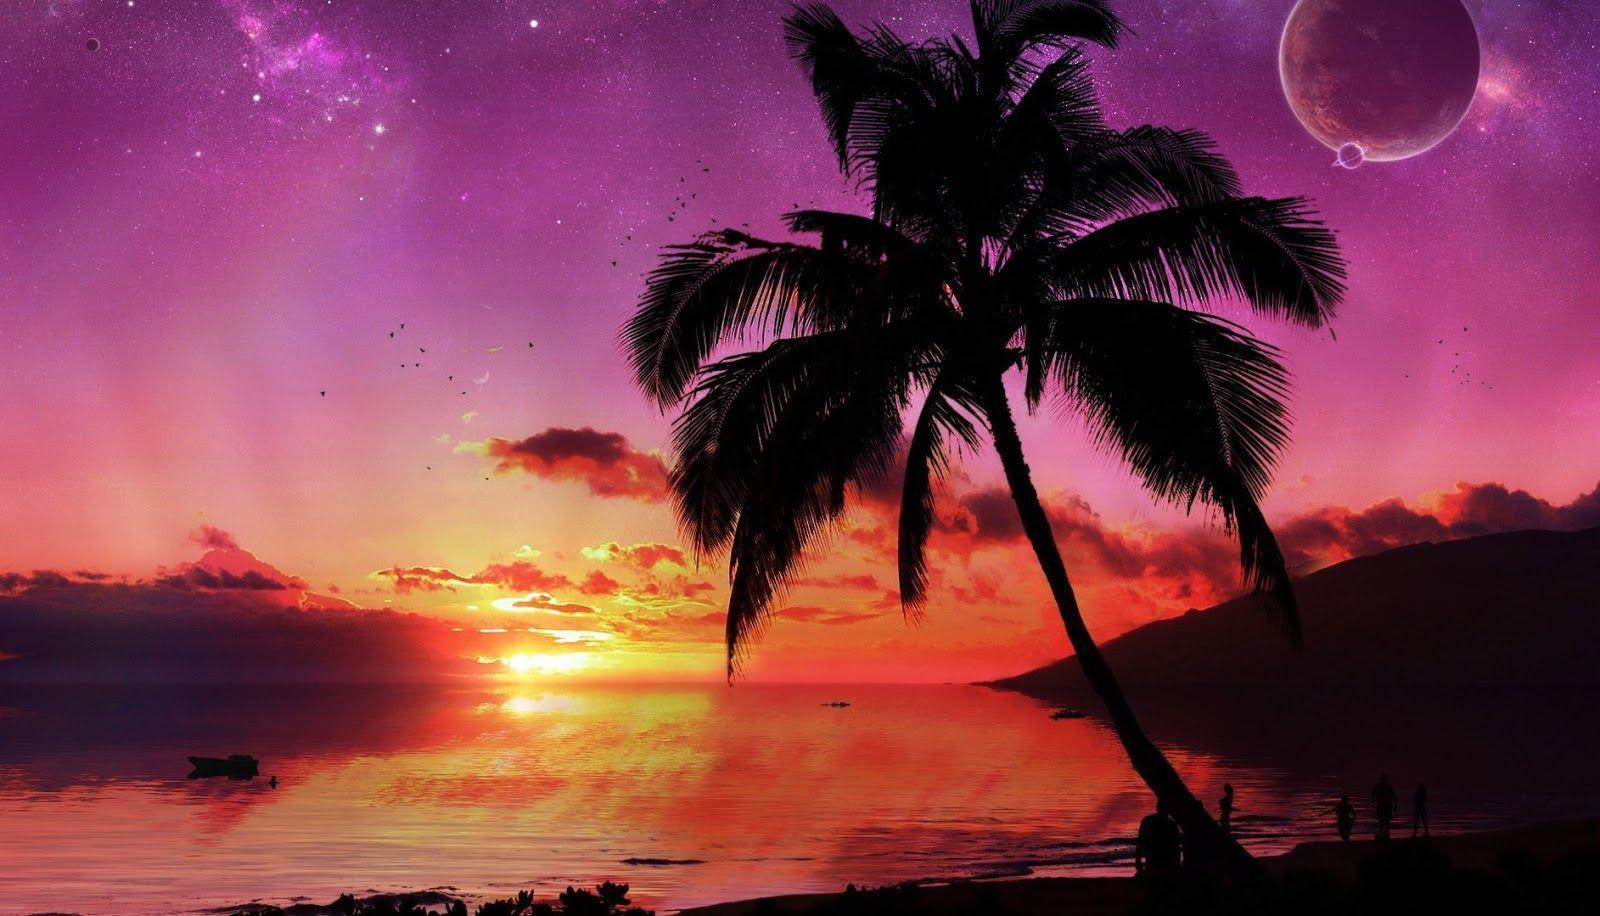 Island Sunset Wallpapers Top Free Island Sunset